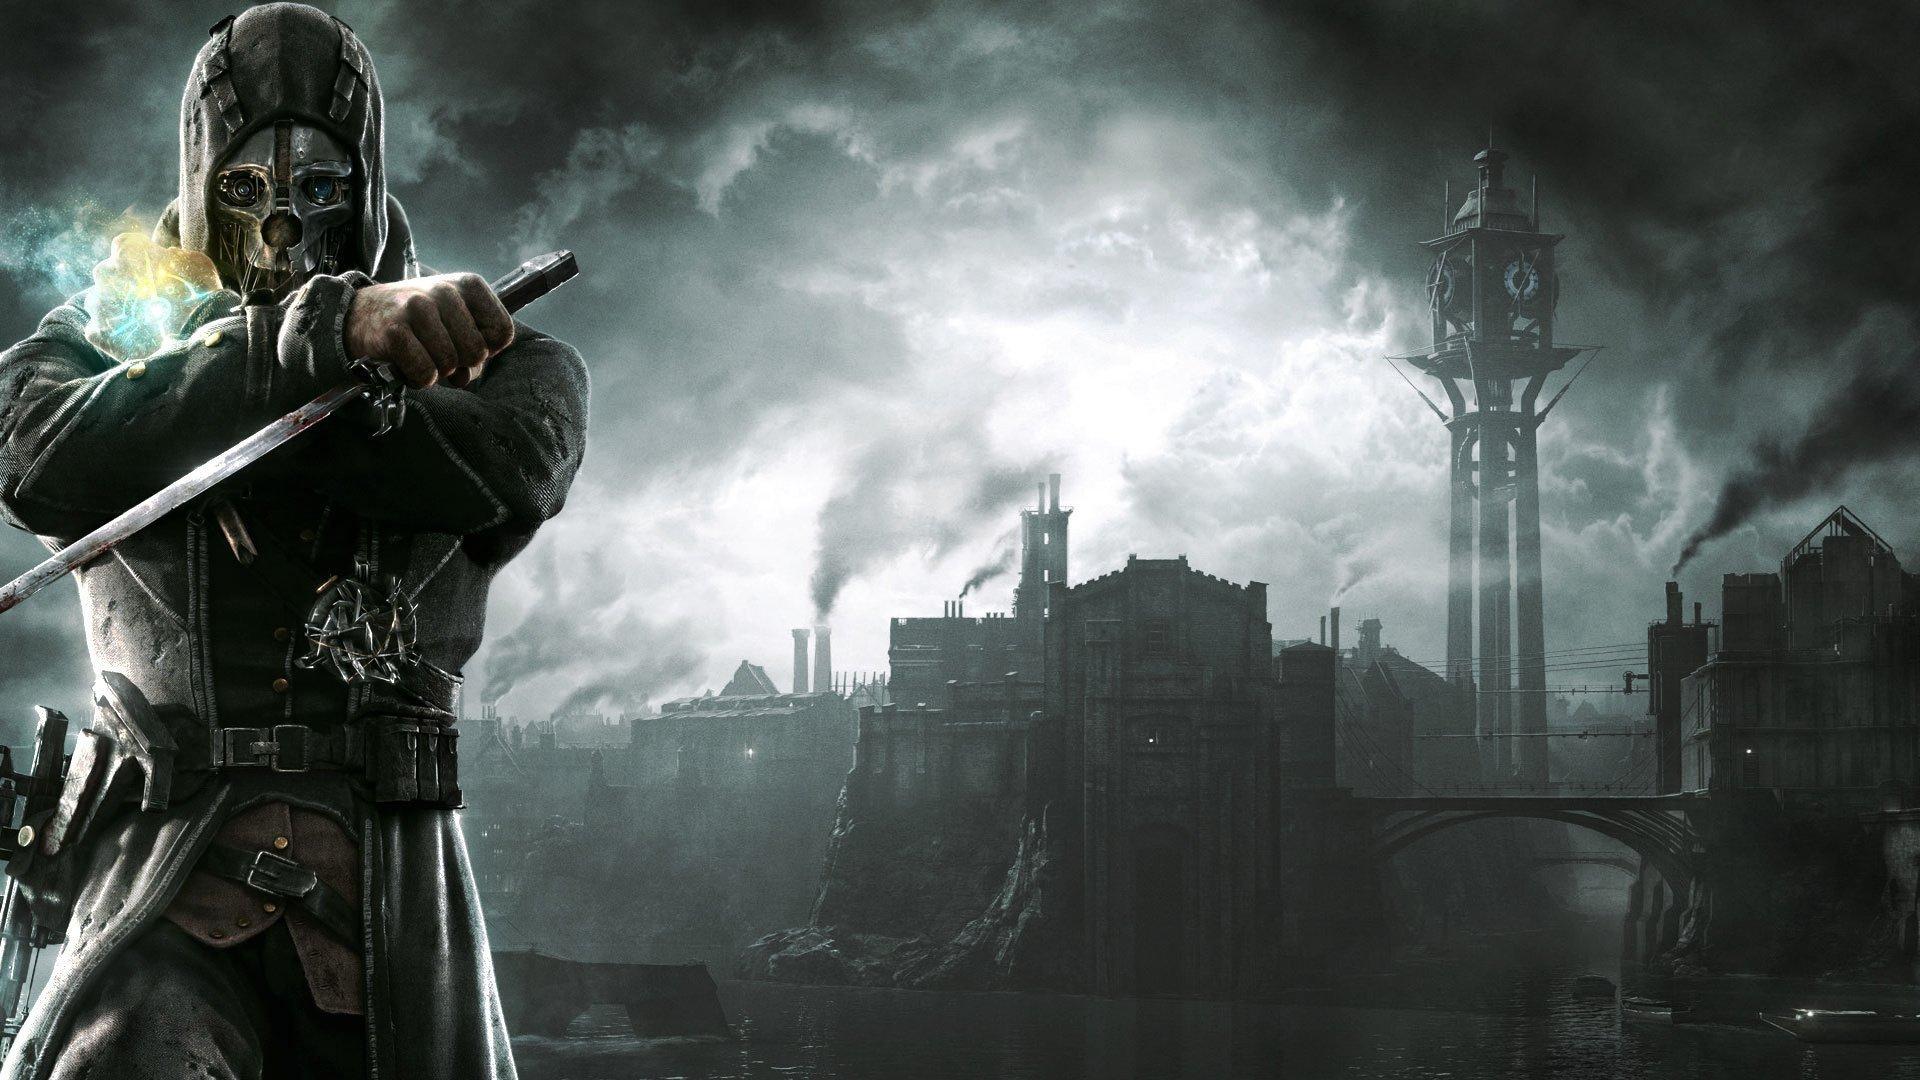 Dishonored Fan Art Corvo Video Games Wallpapers Hd: Dishonored HD Wallpaper